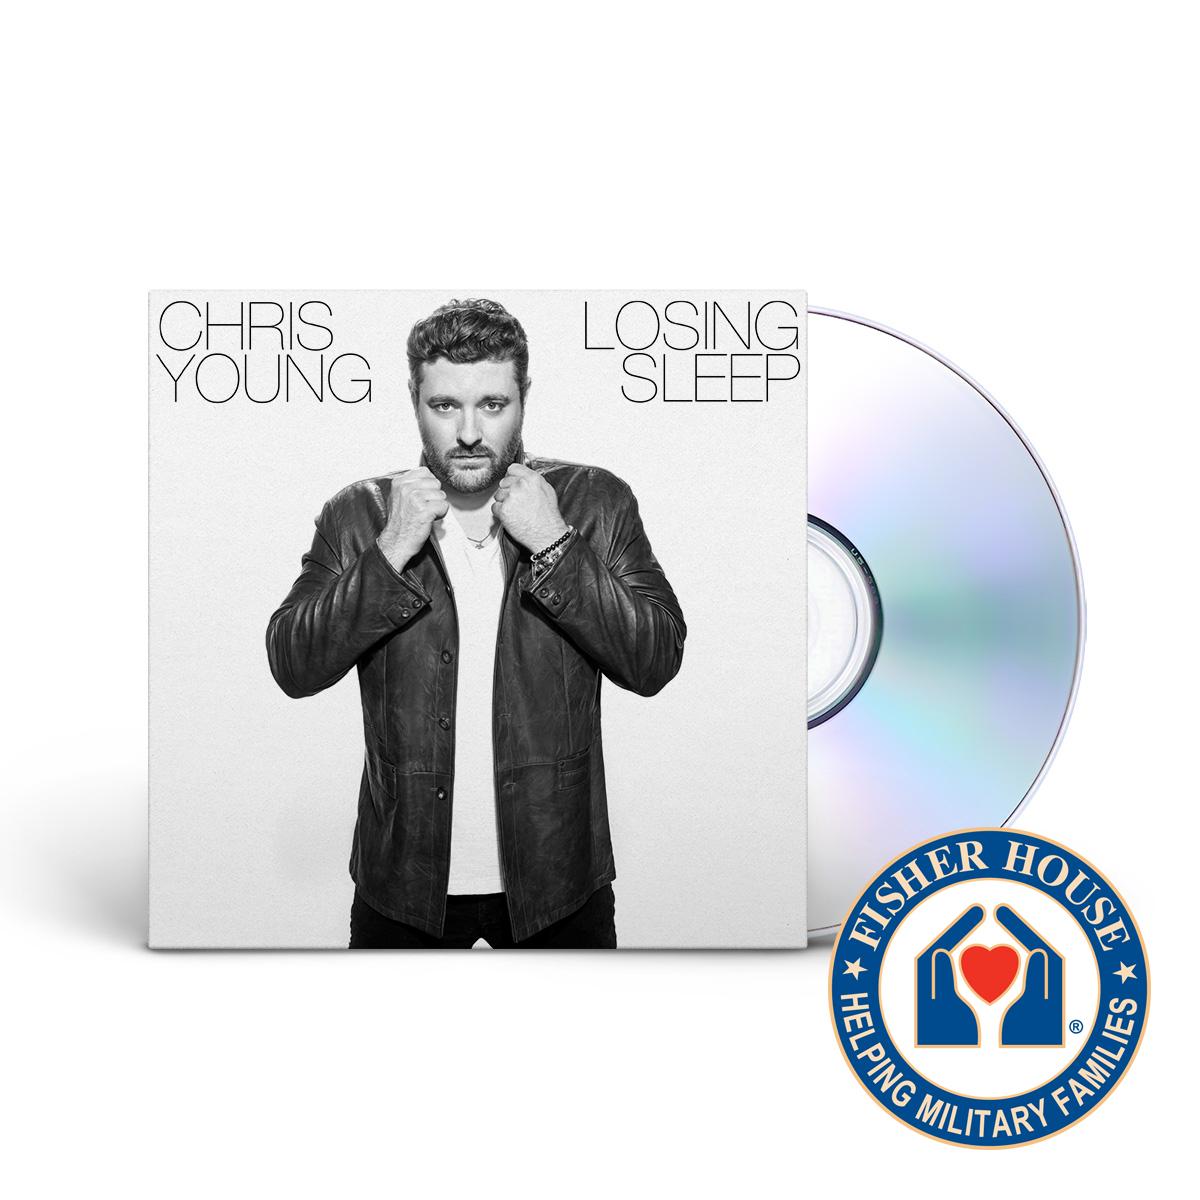 Chris Young Losing Sleep CD